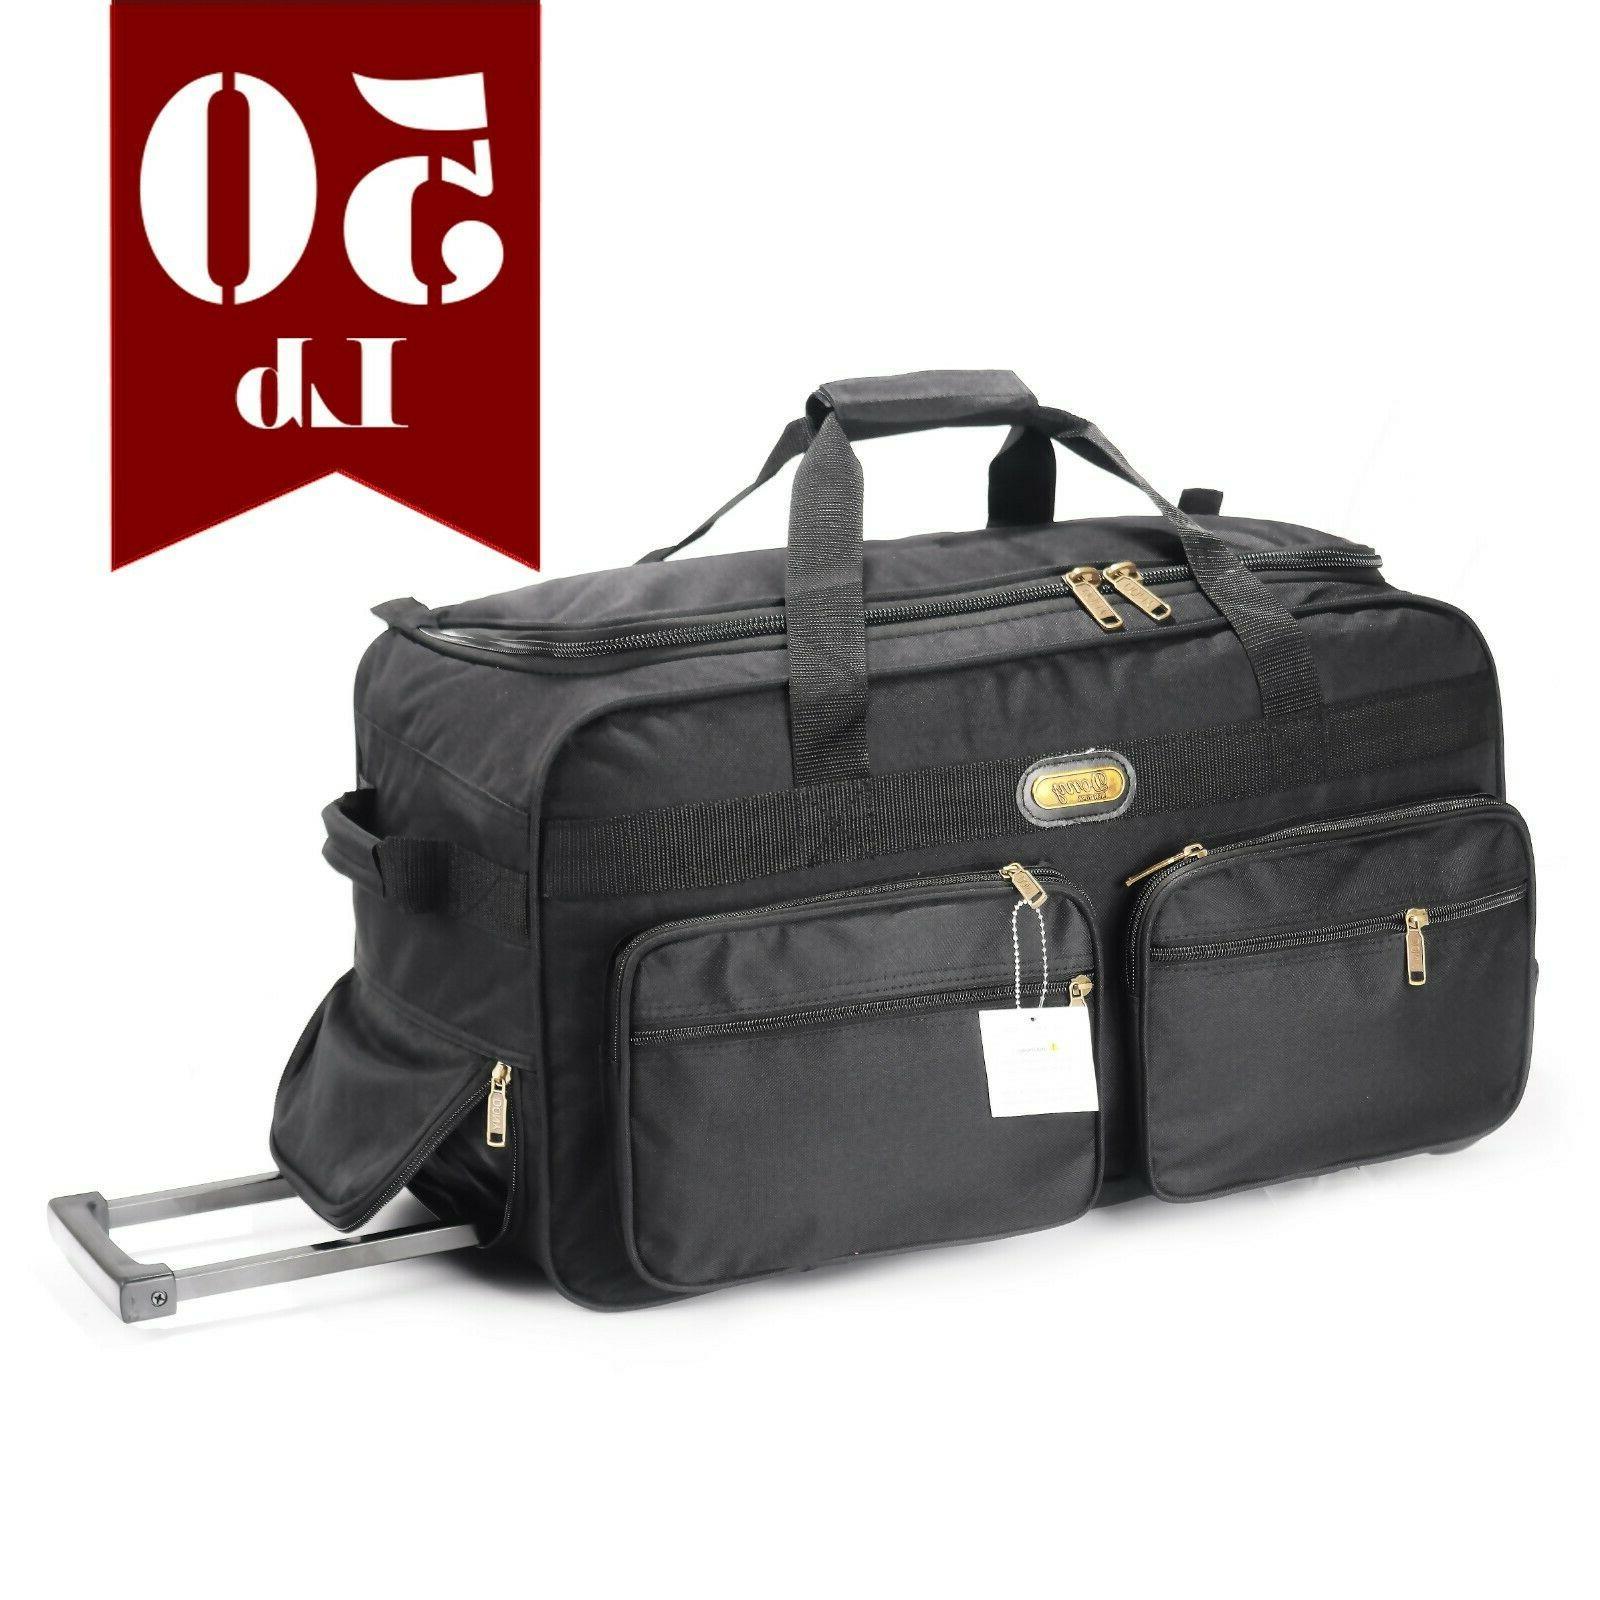 Luggage Rolling Bag Carry Lighweight